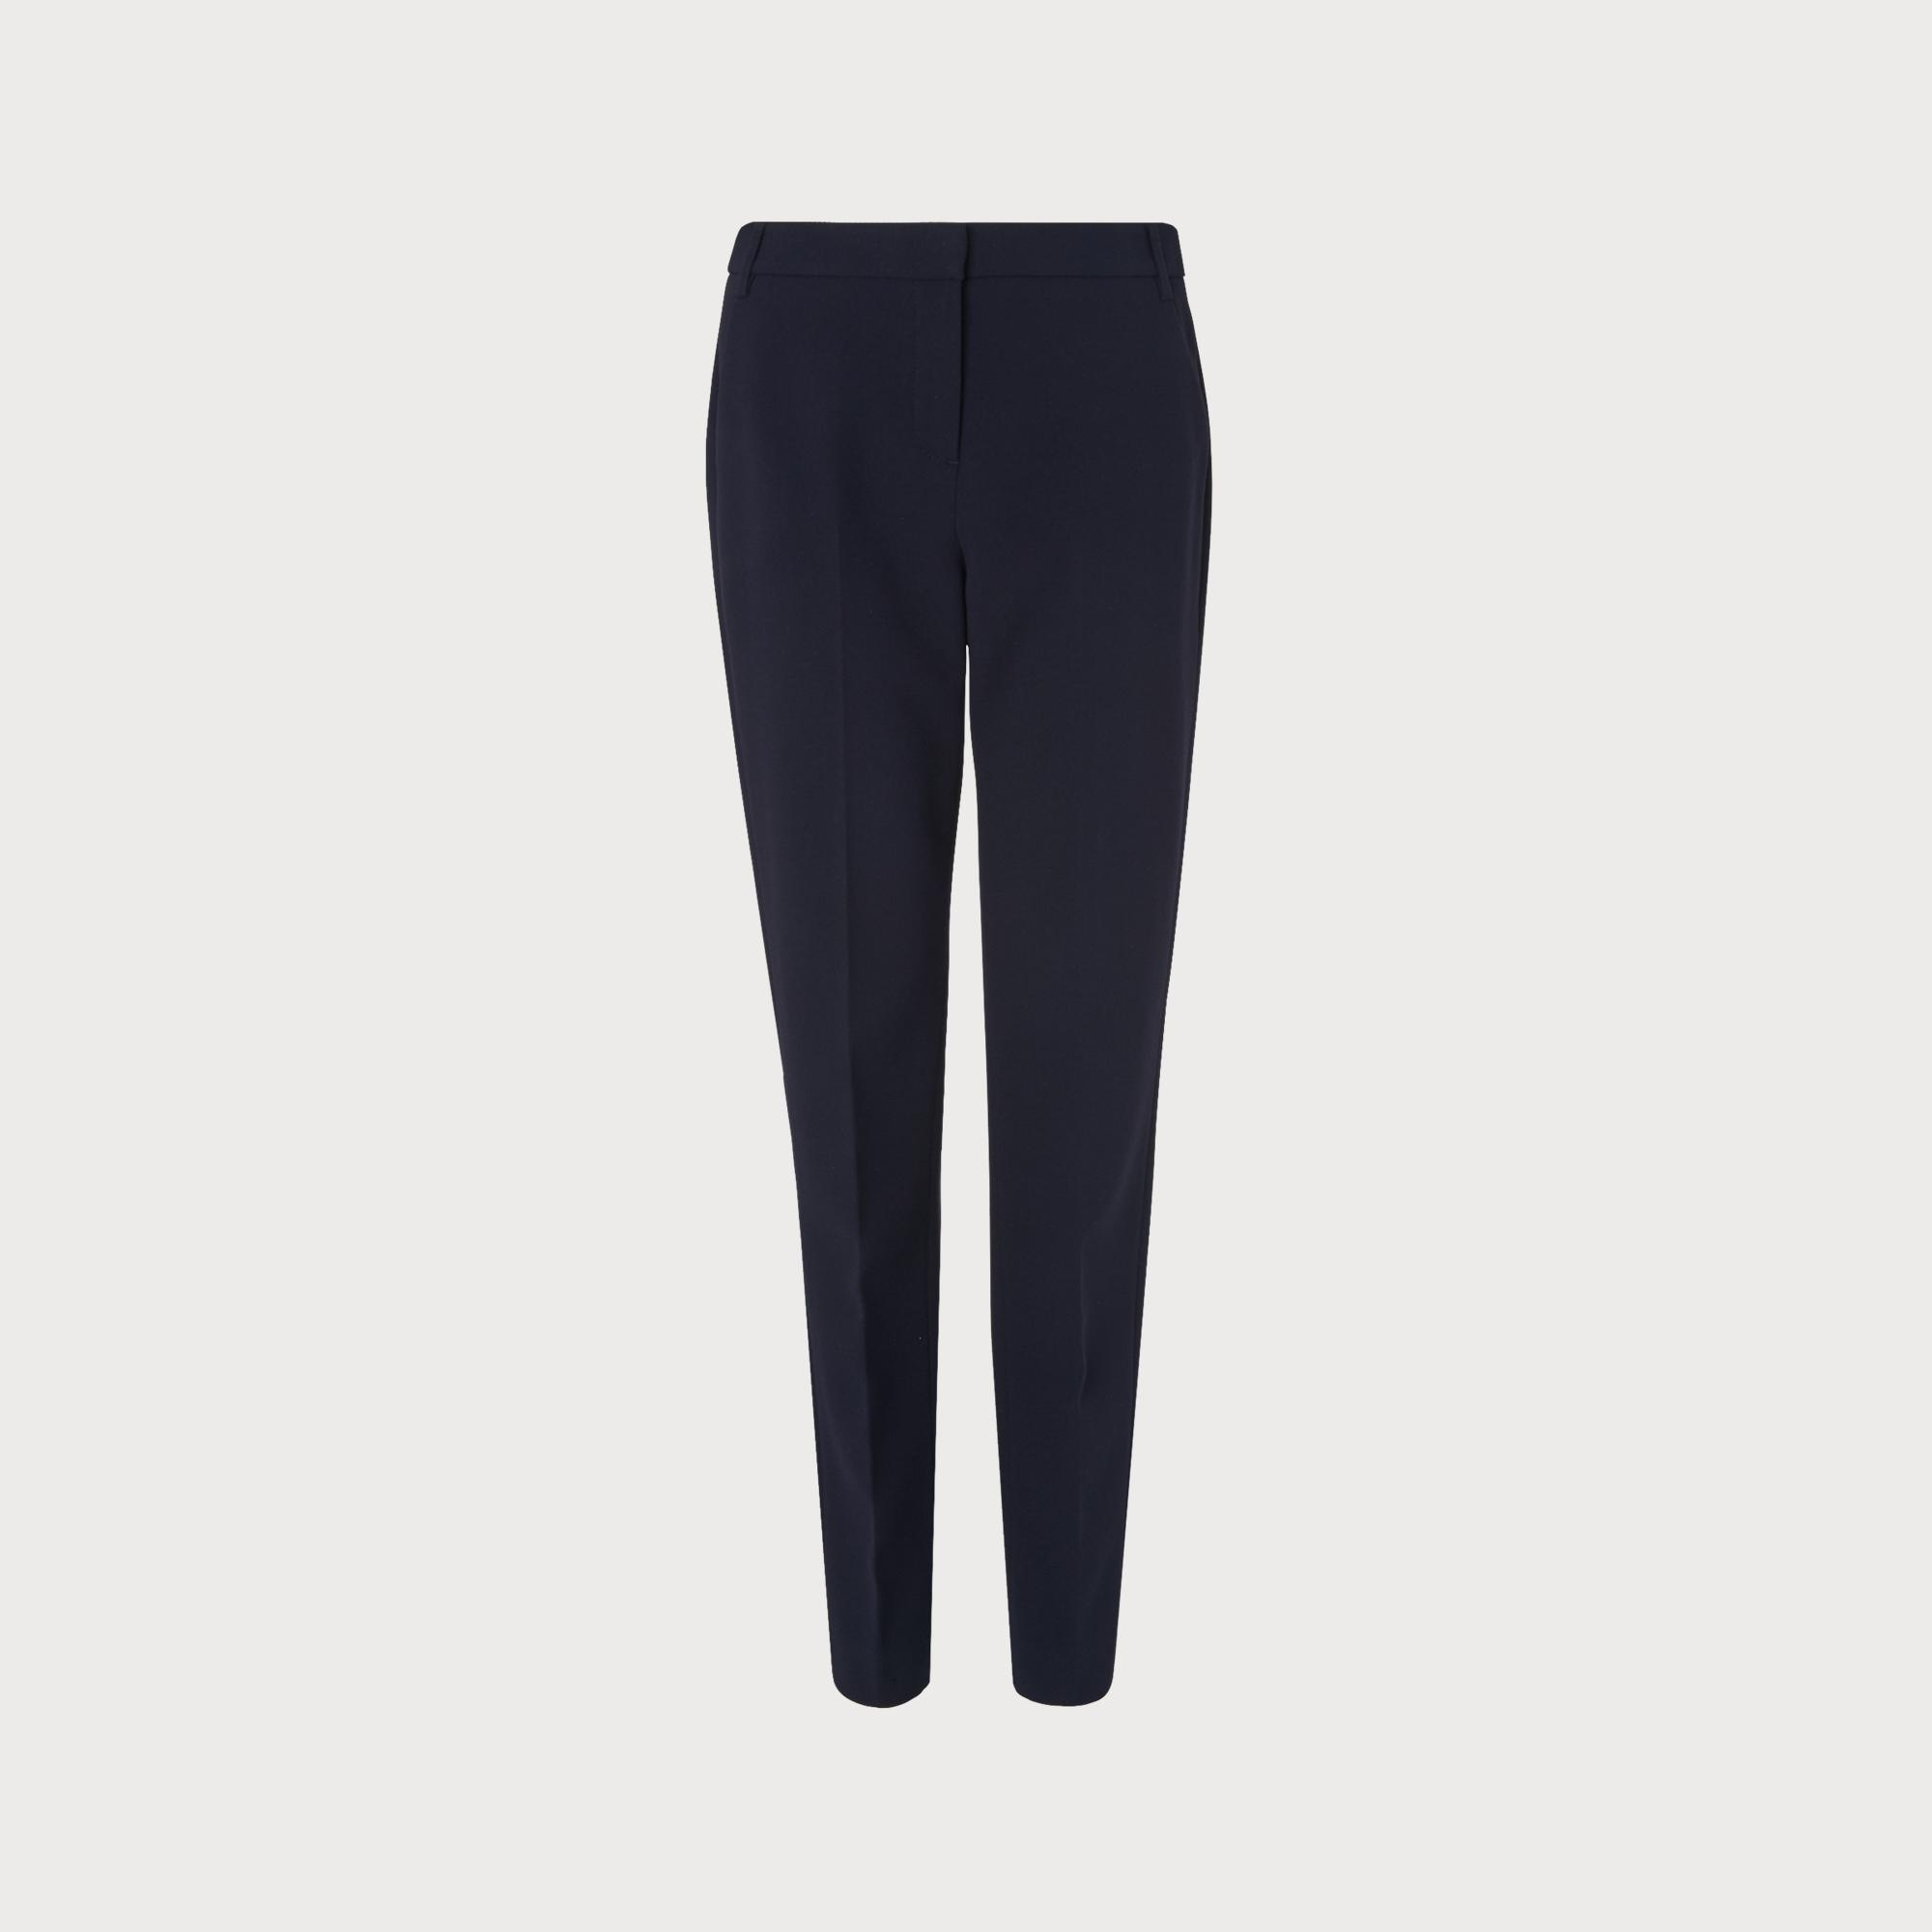 Evie Navy Pants